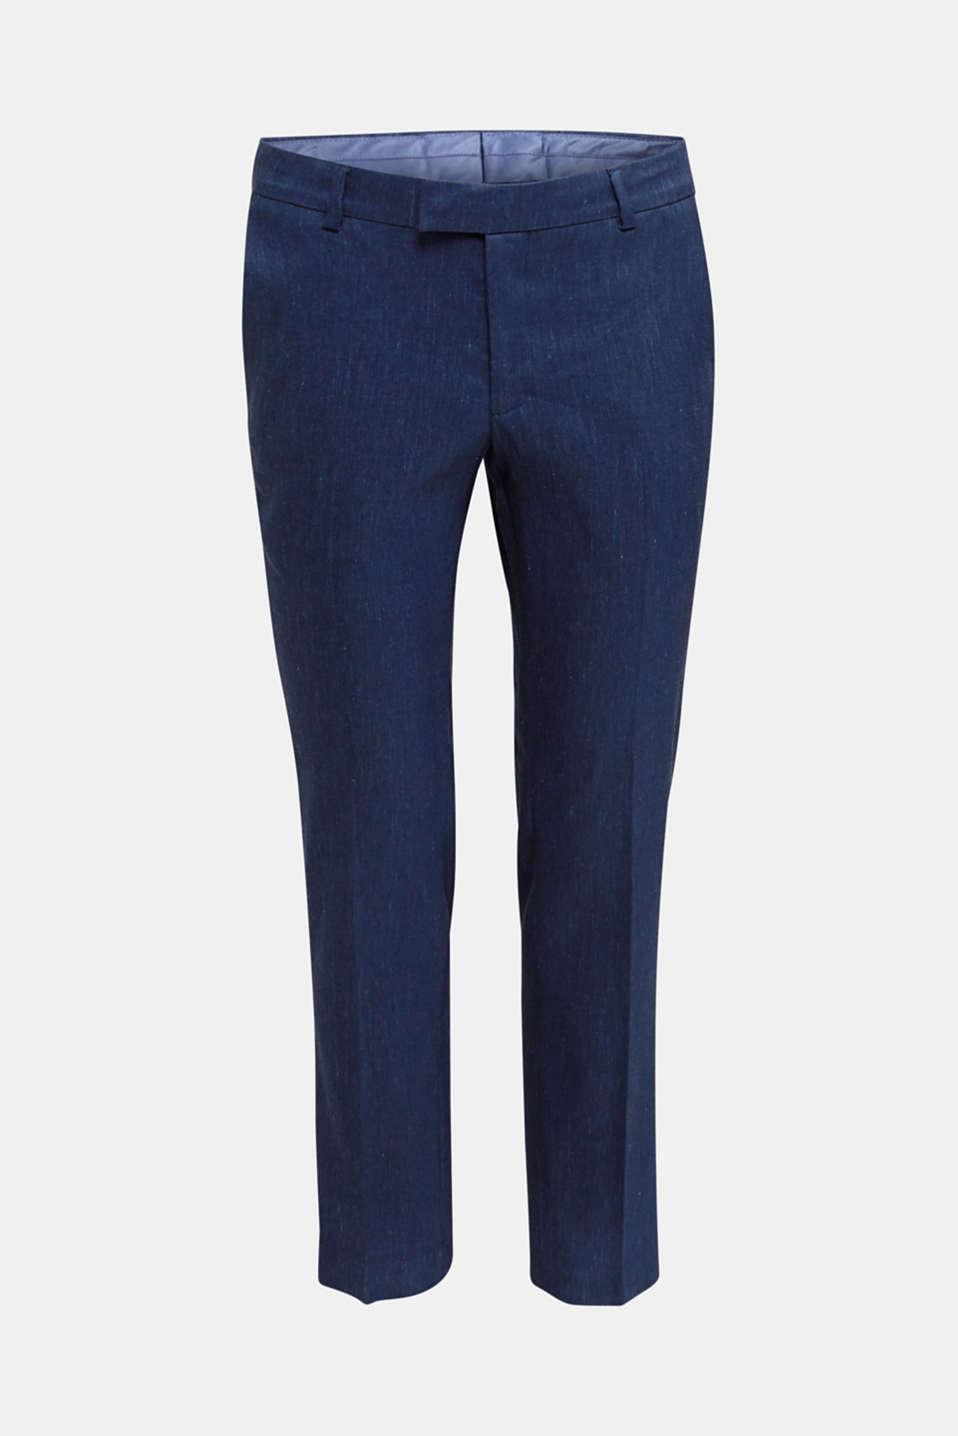 End-on-end linen blend trousers, DARK BLUE 5, detail image number 5